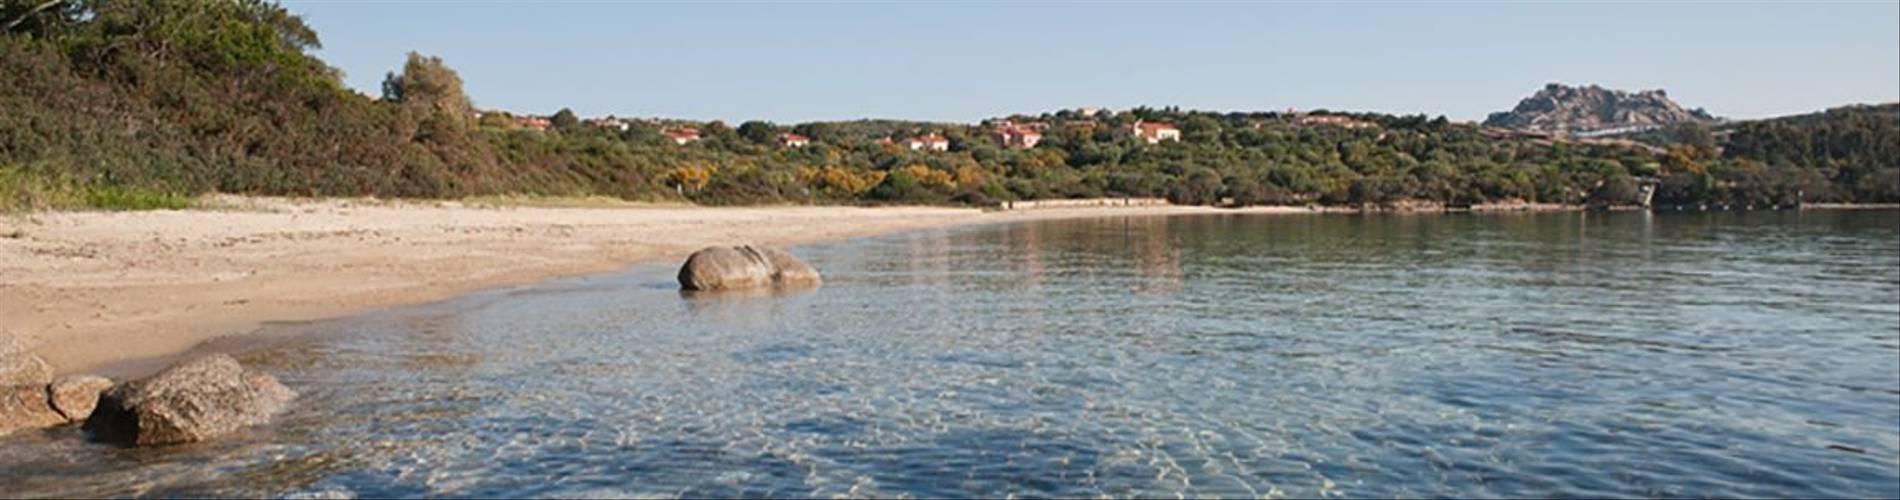 Le Saline, Sardinia, Italy (2).jpg